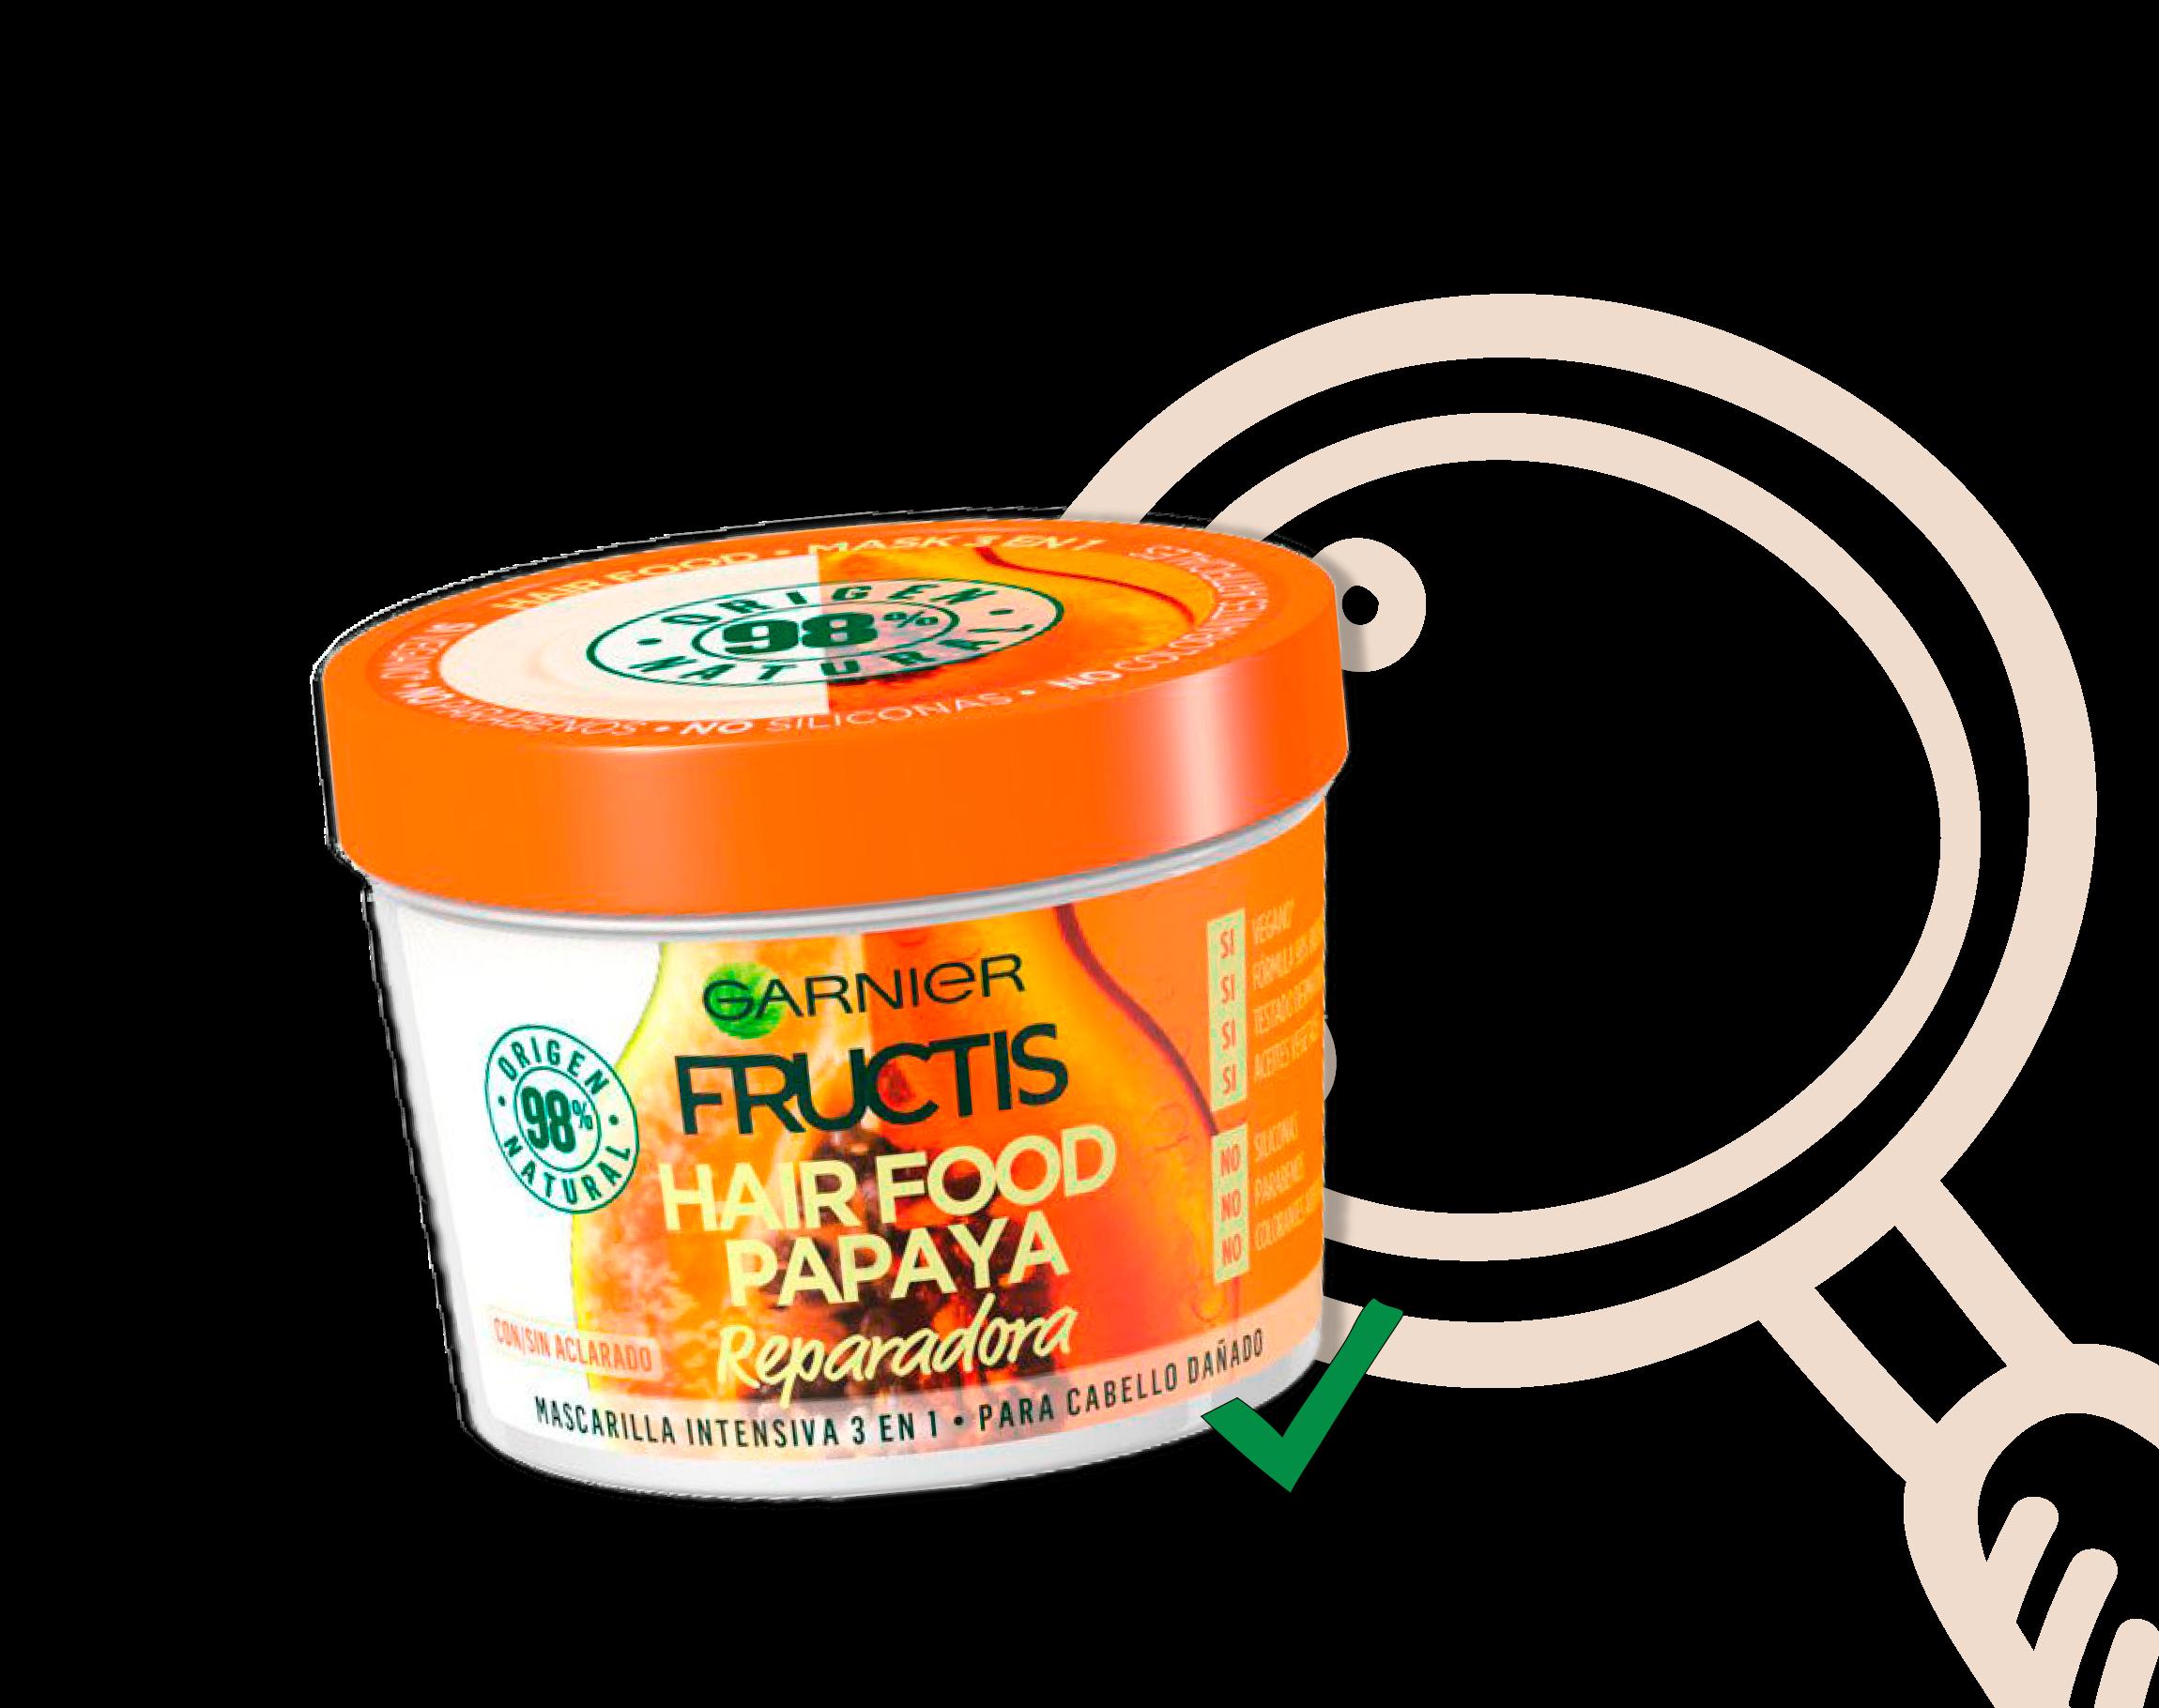 Analizamos Garnier Fructis Hair Food Papaya